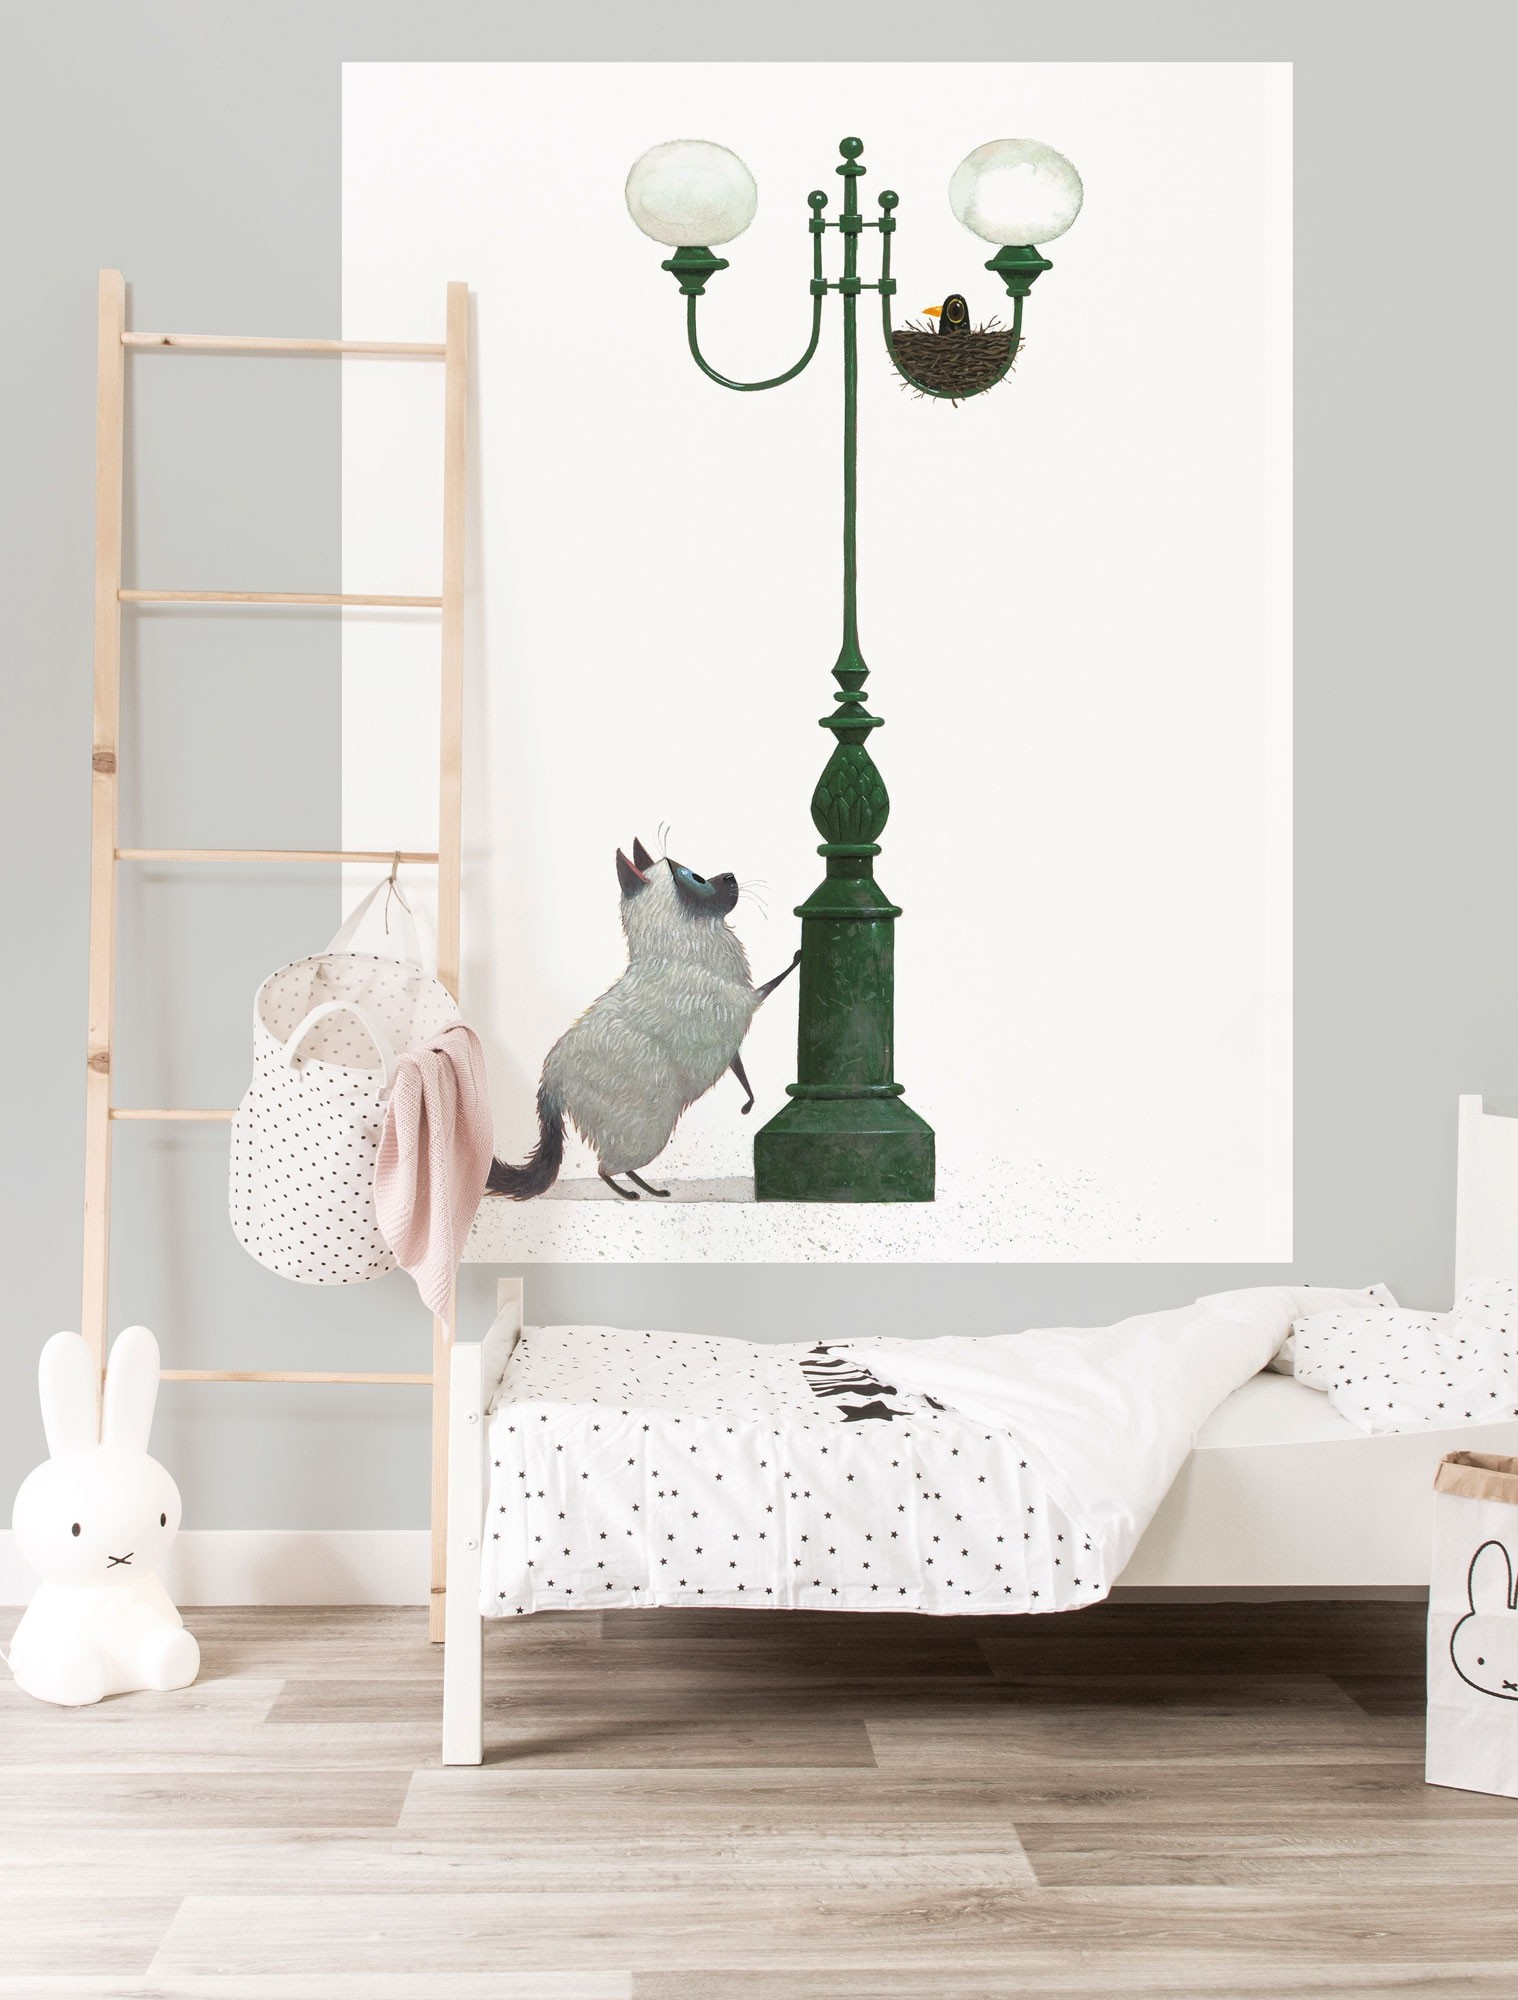 KEK Wallpaper Panel, Behangpaneel A Home for Harry, 142.5 x 180 cm-8719743886209-311